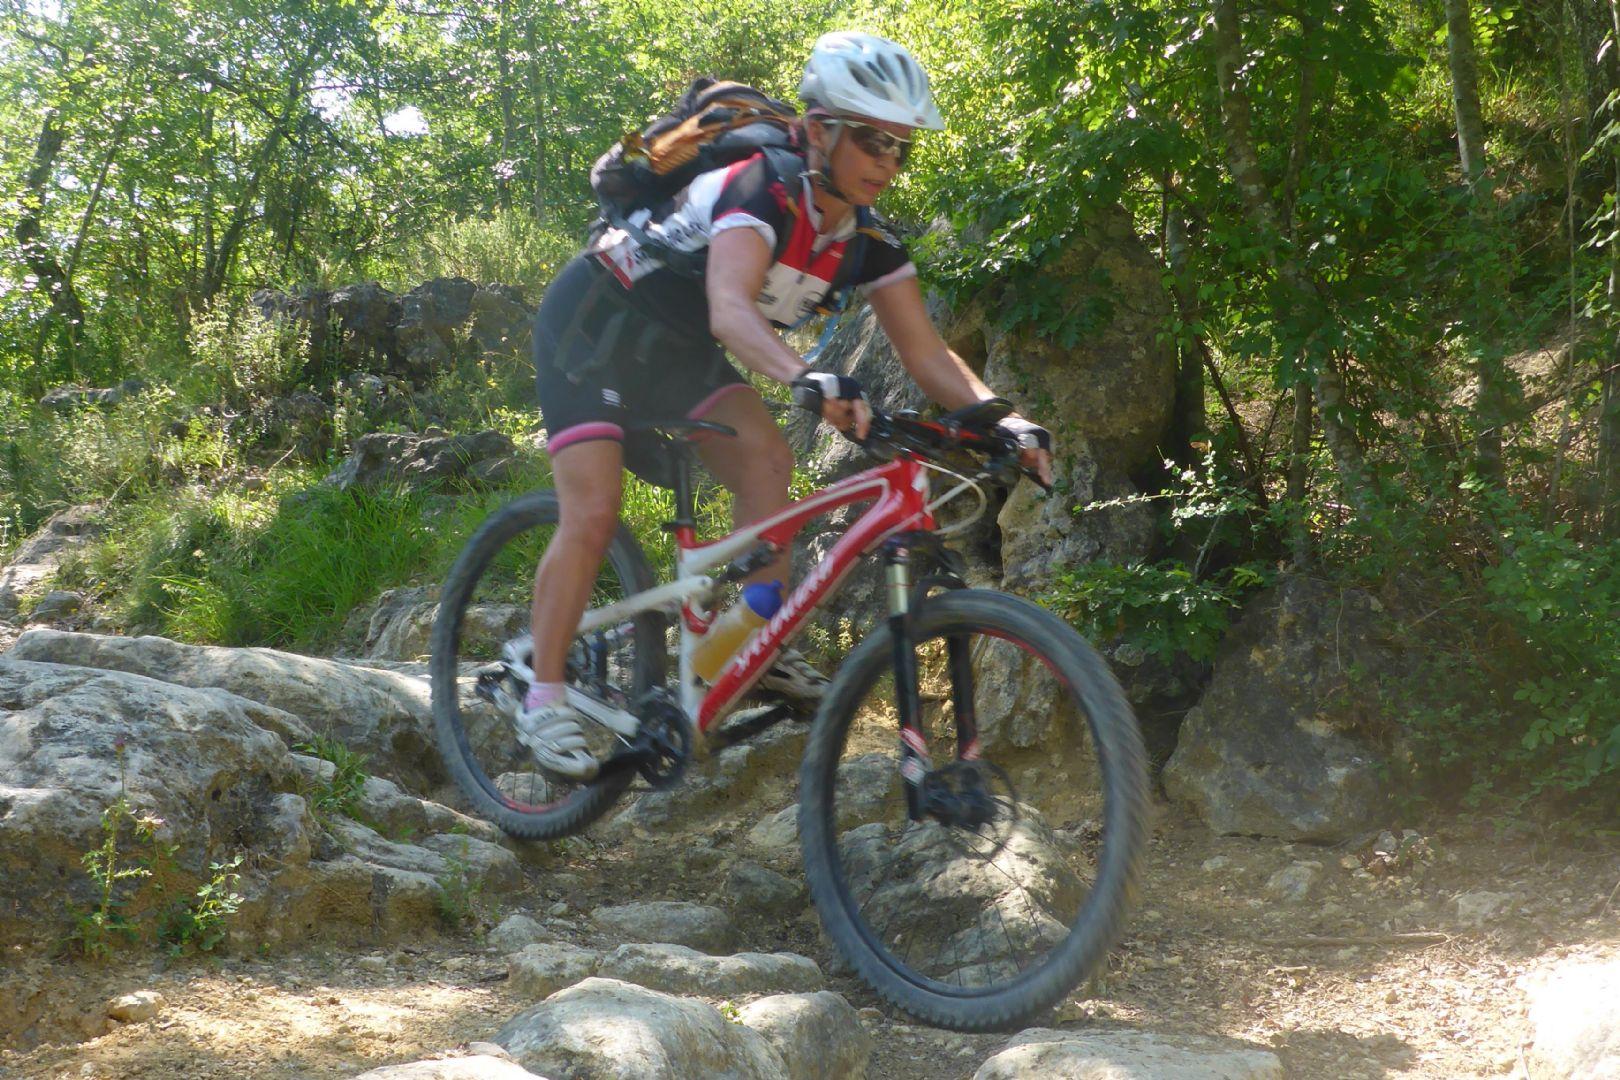 P1010581x.jpg - Italy - Tuscany - Sacred Routes - Guided Mountain Bike Holiday - Mountain Biking